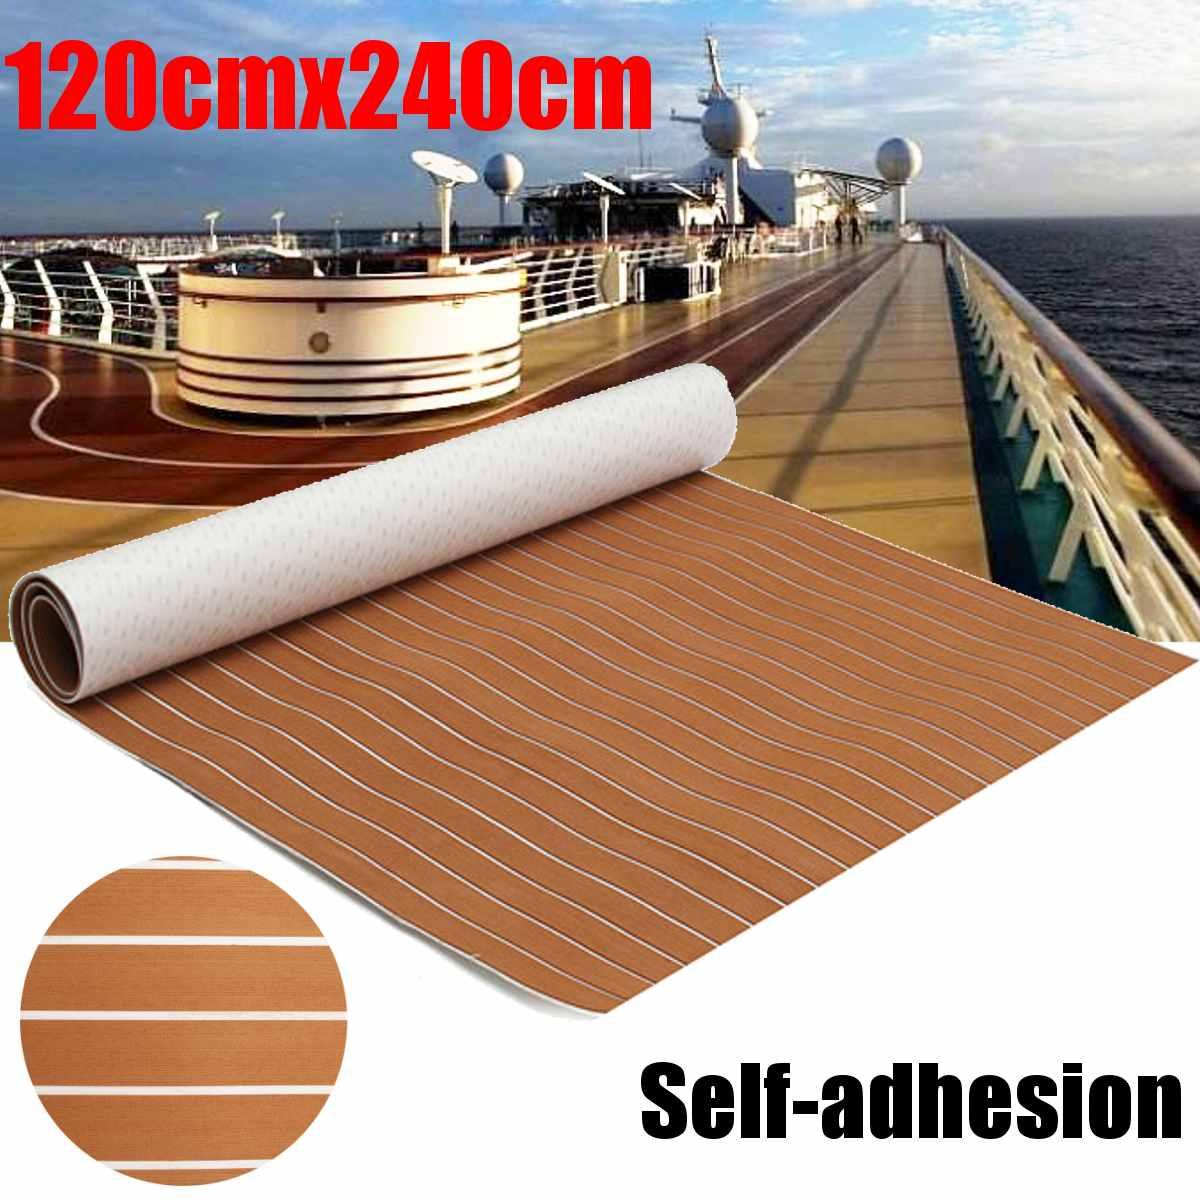 1200x2400x5mm Self Adhesive EVA Foam Teak Sheet Teak Flooring Teak Boat Decking Marine Car Yacht Floor Mat Synthetic Teak Pad